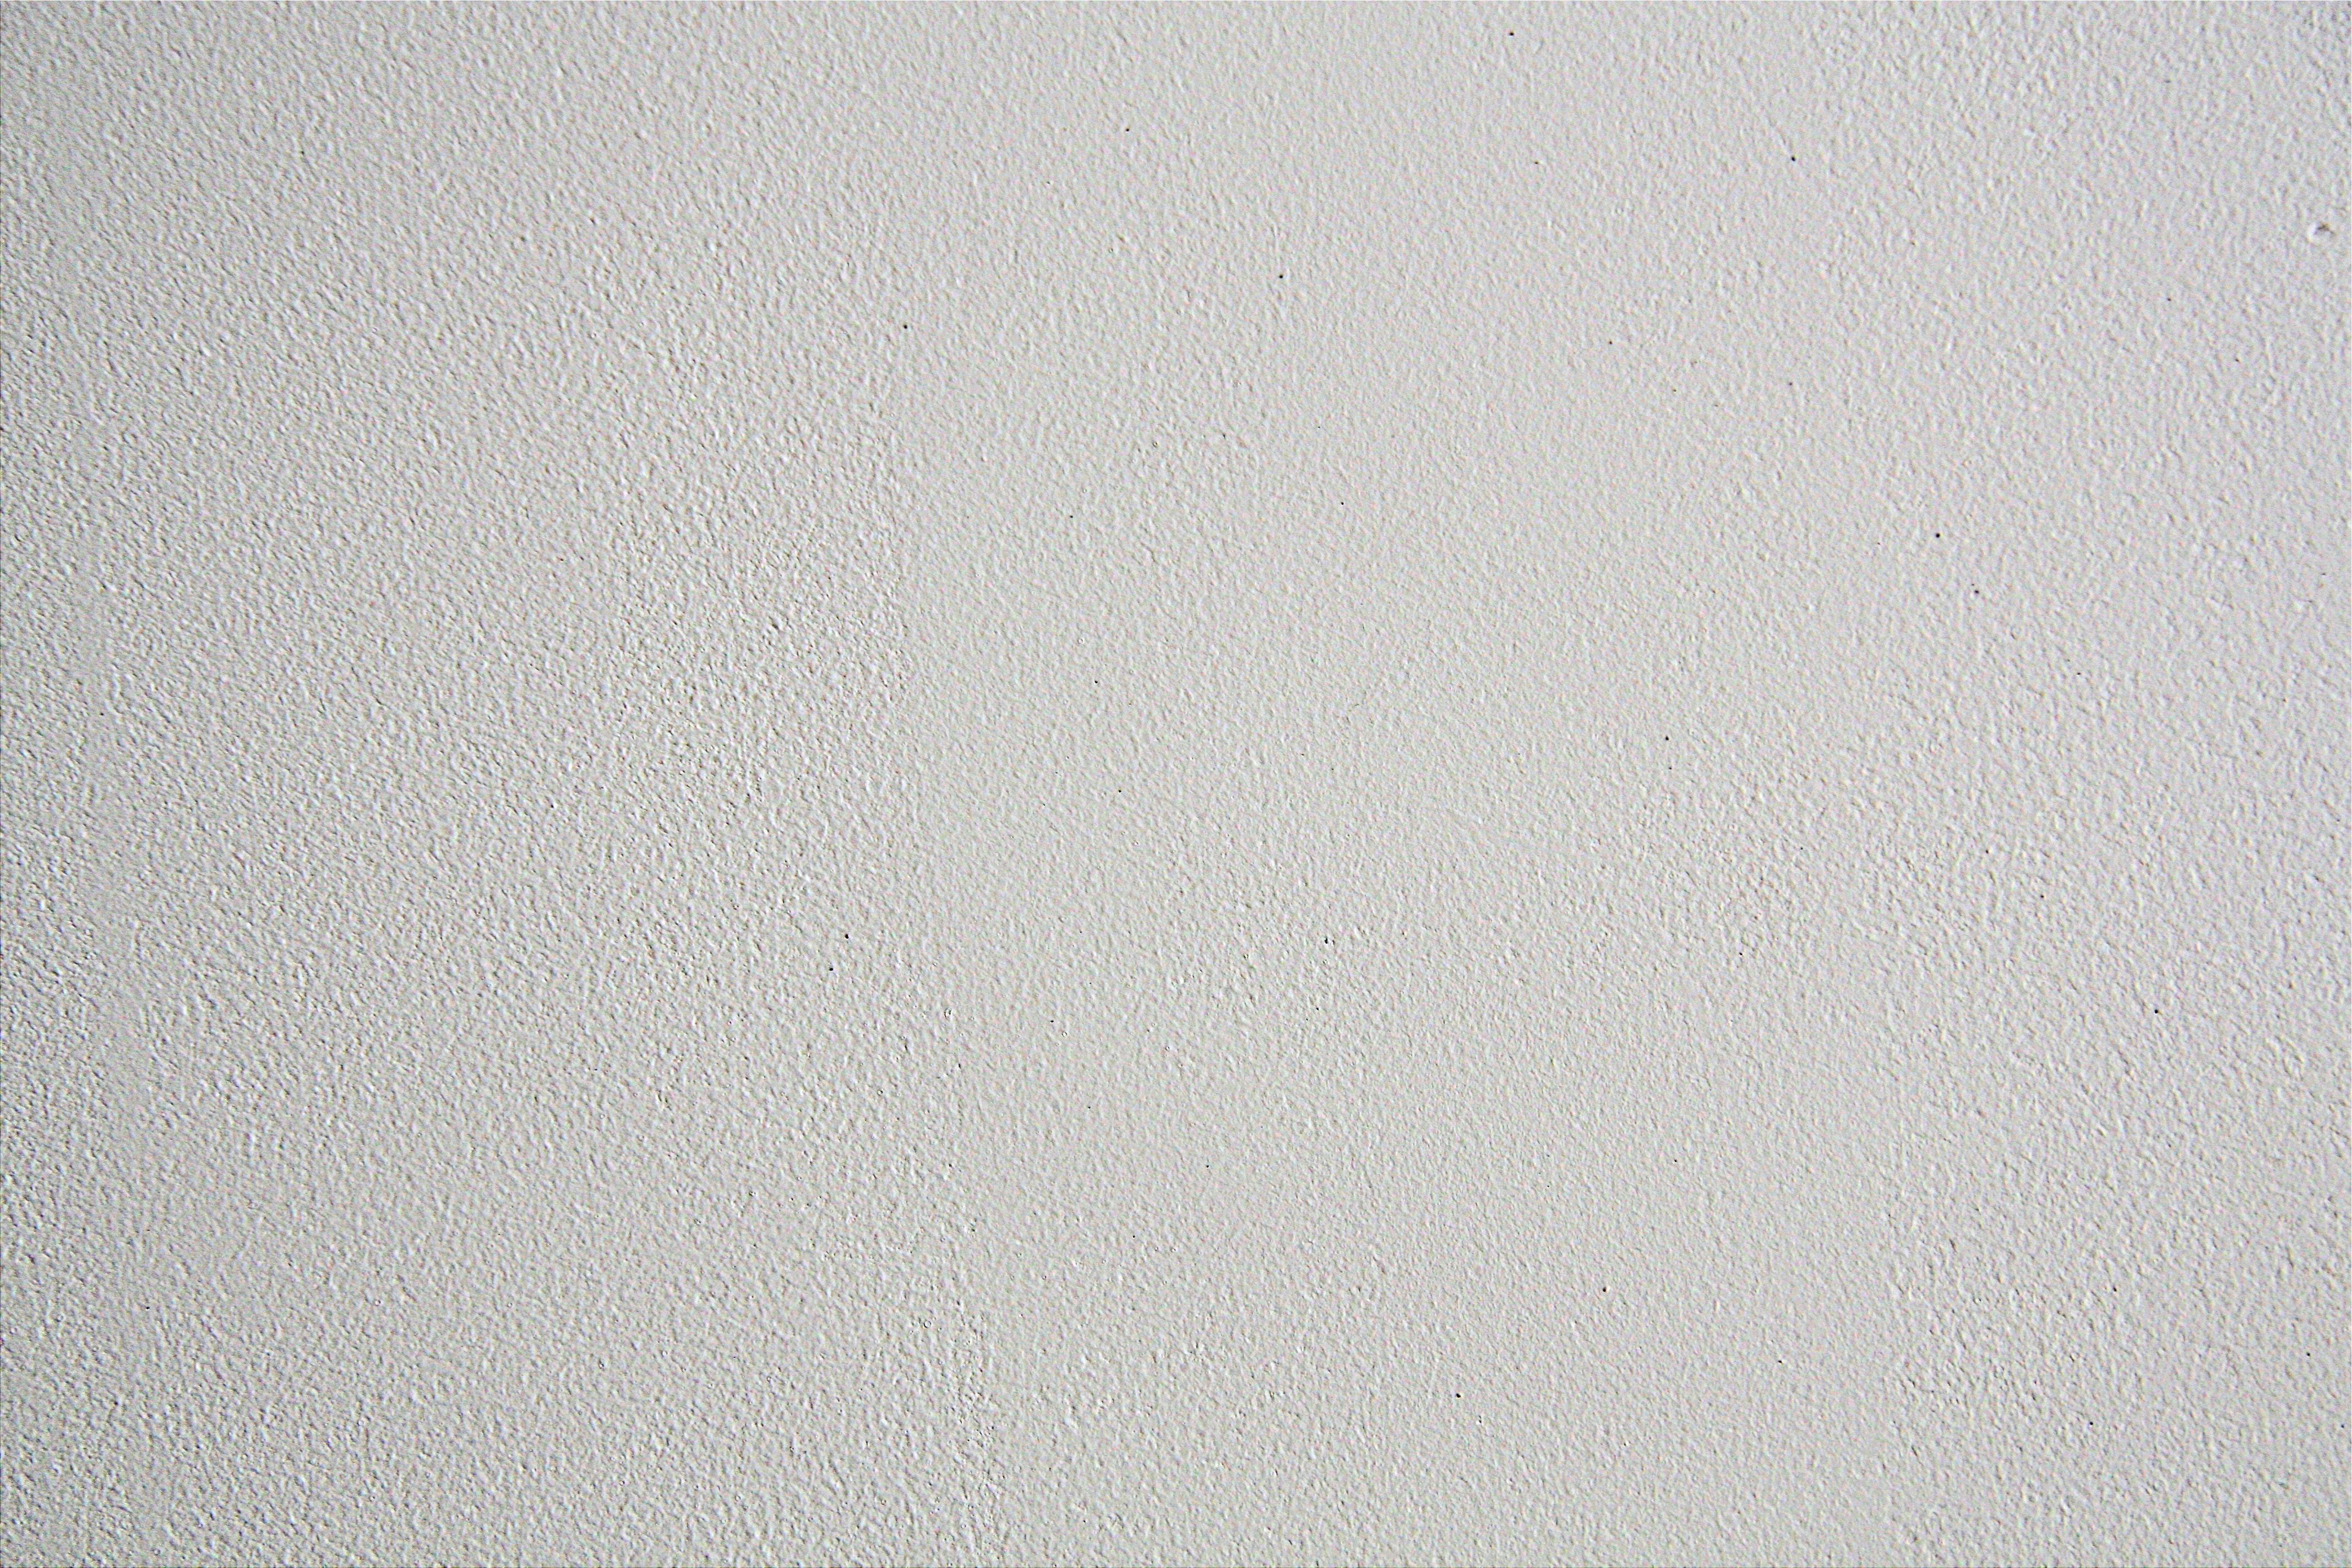 1000 Beautiful Concrete Texture Photos 183 Pexels 183 Free